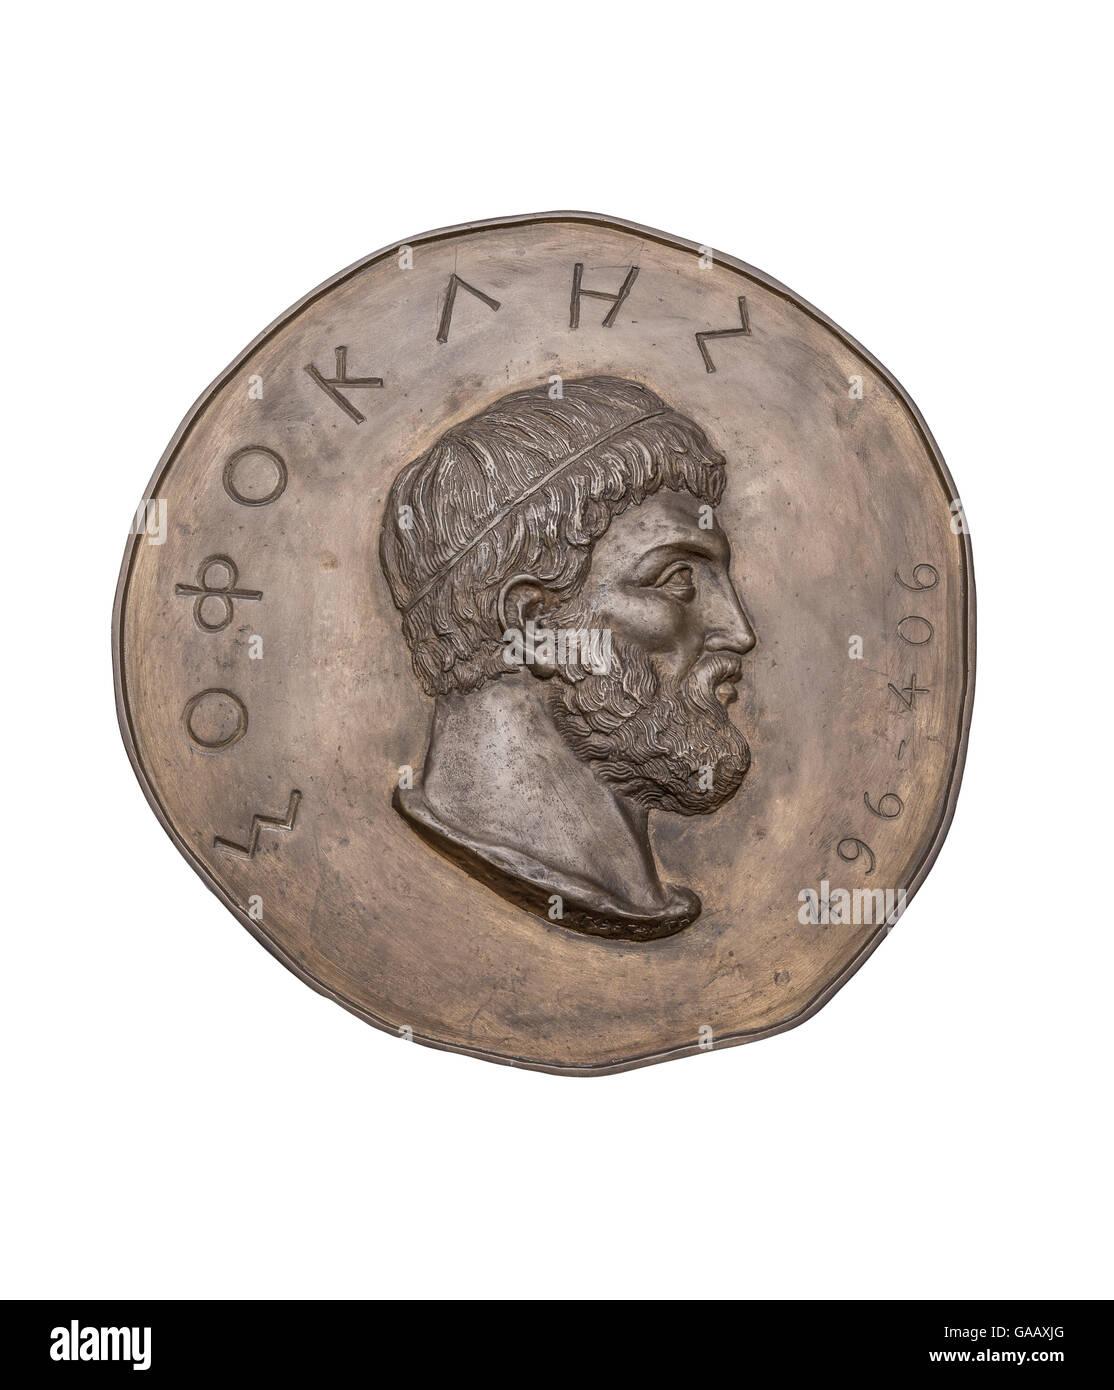 Greek Novelist Sophocles on Ancient Bronze Medal - Stock Image